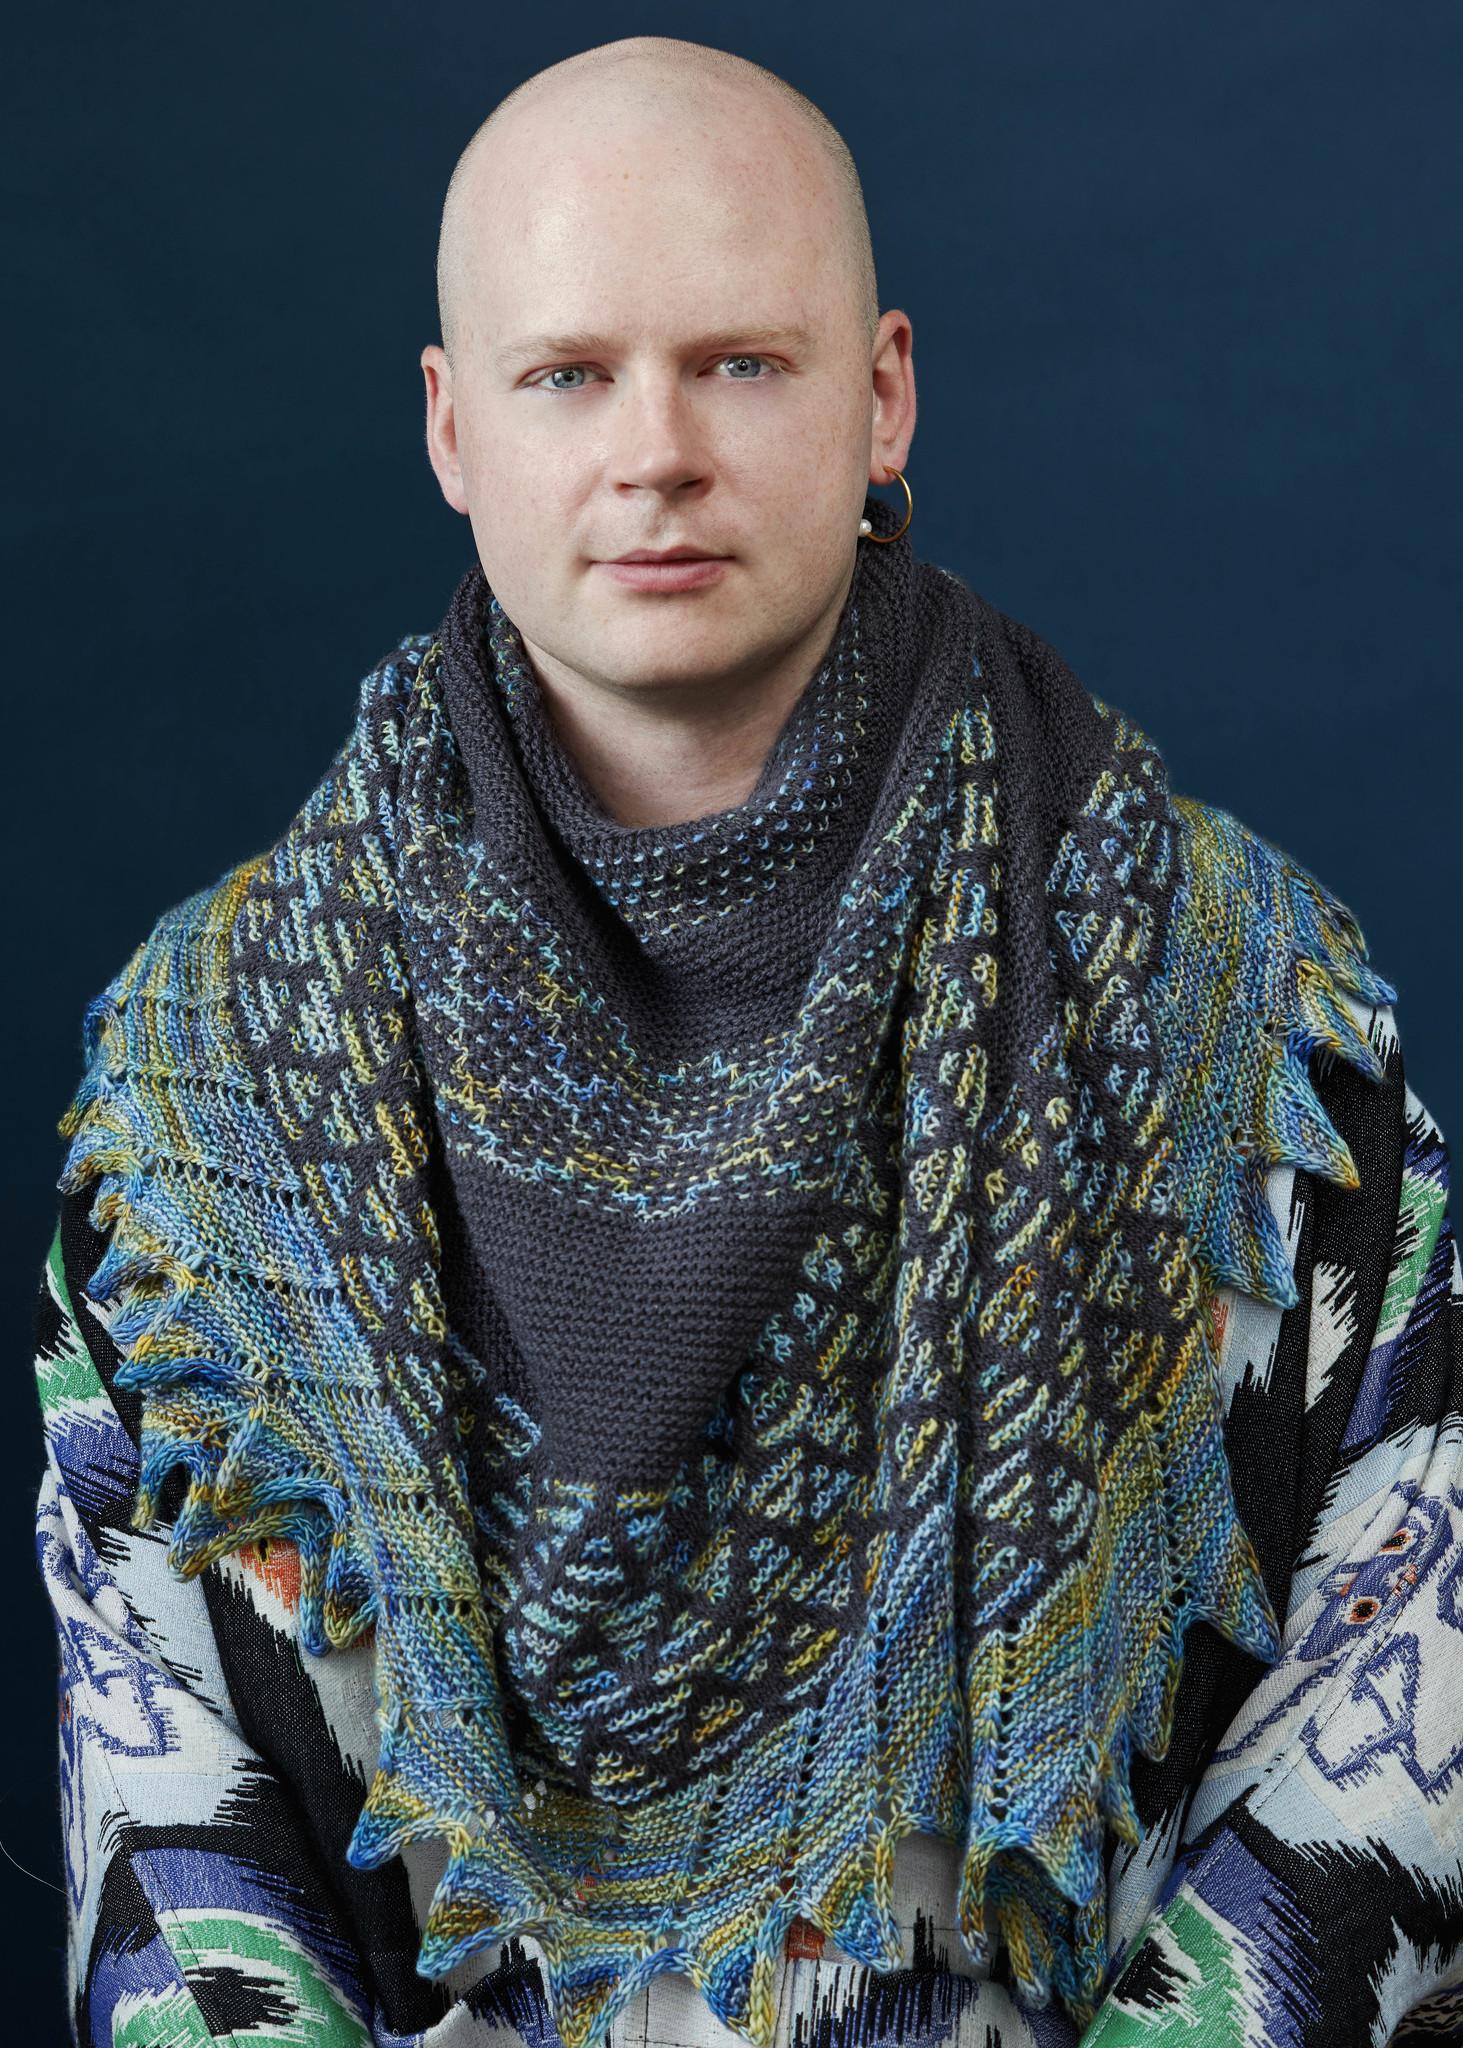 Westknits WESTKNITS KIT MOSAIC MUSINGS - GREEN